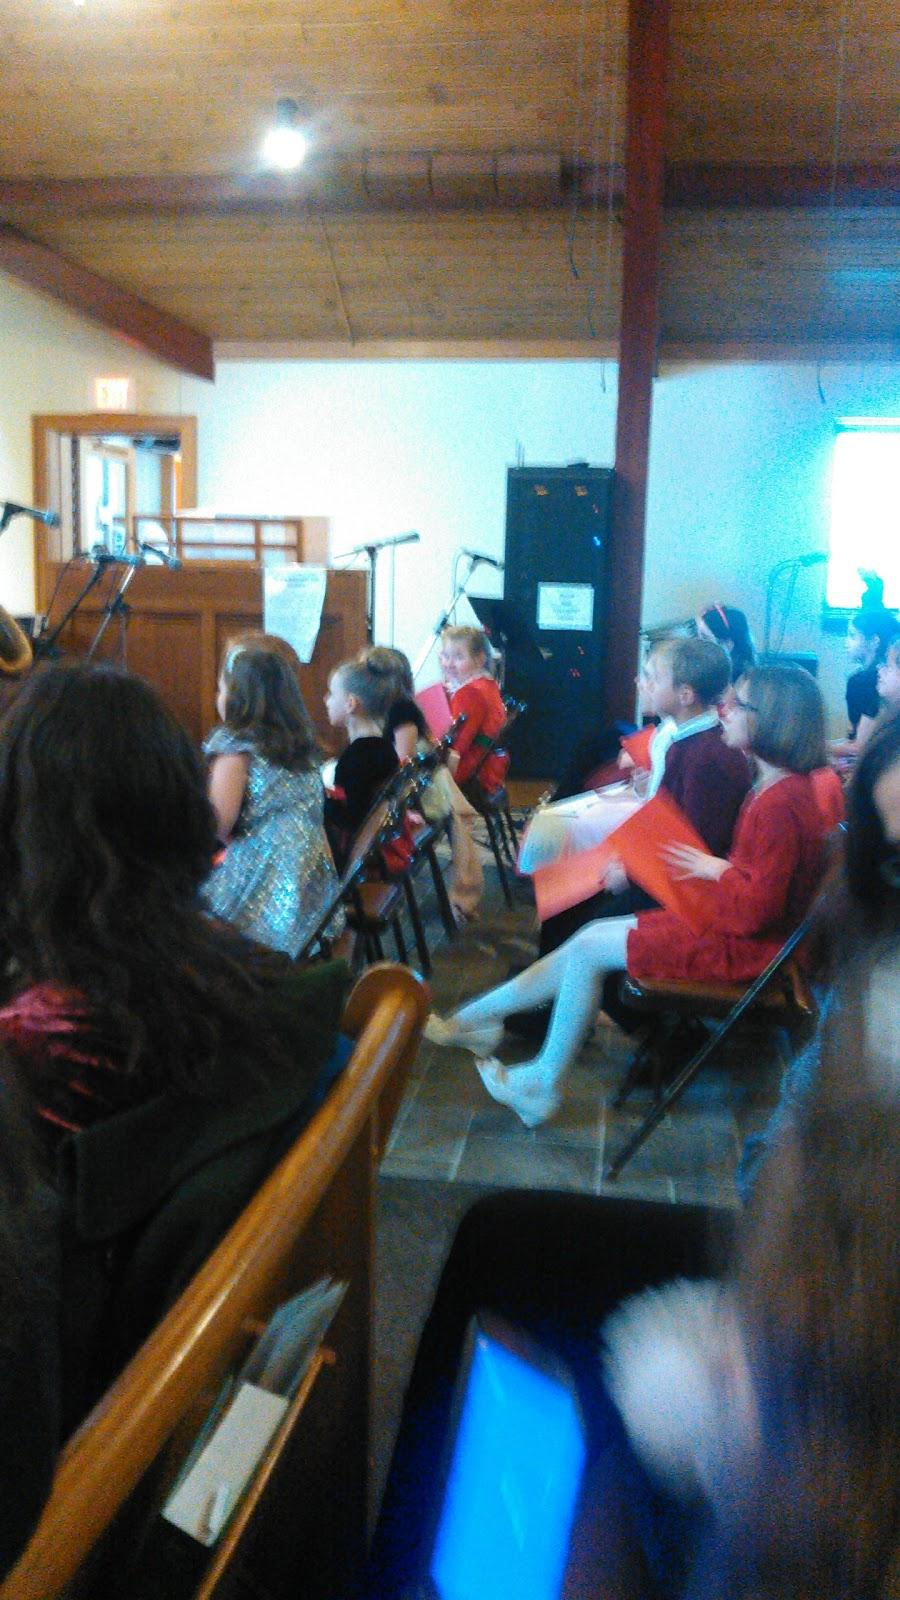 St Gabriels RC Church - church    Photo 5 of 10   Address: 5271 Clinton St, Elma, NY 14059, USA   Phone: (716) 668-4017